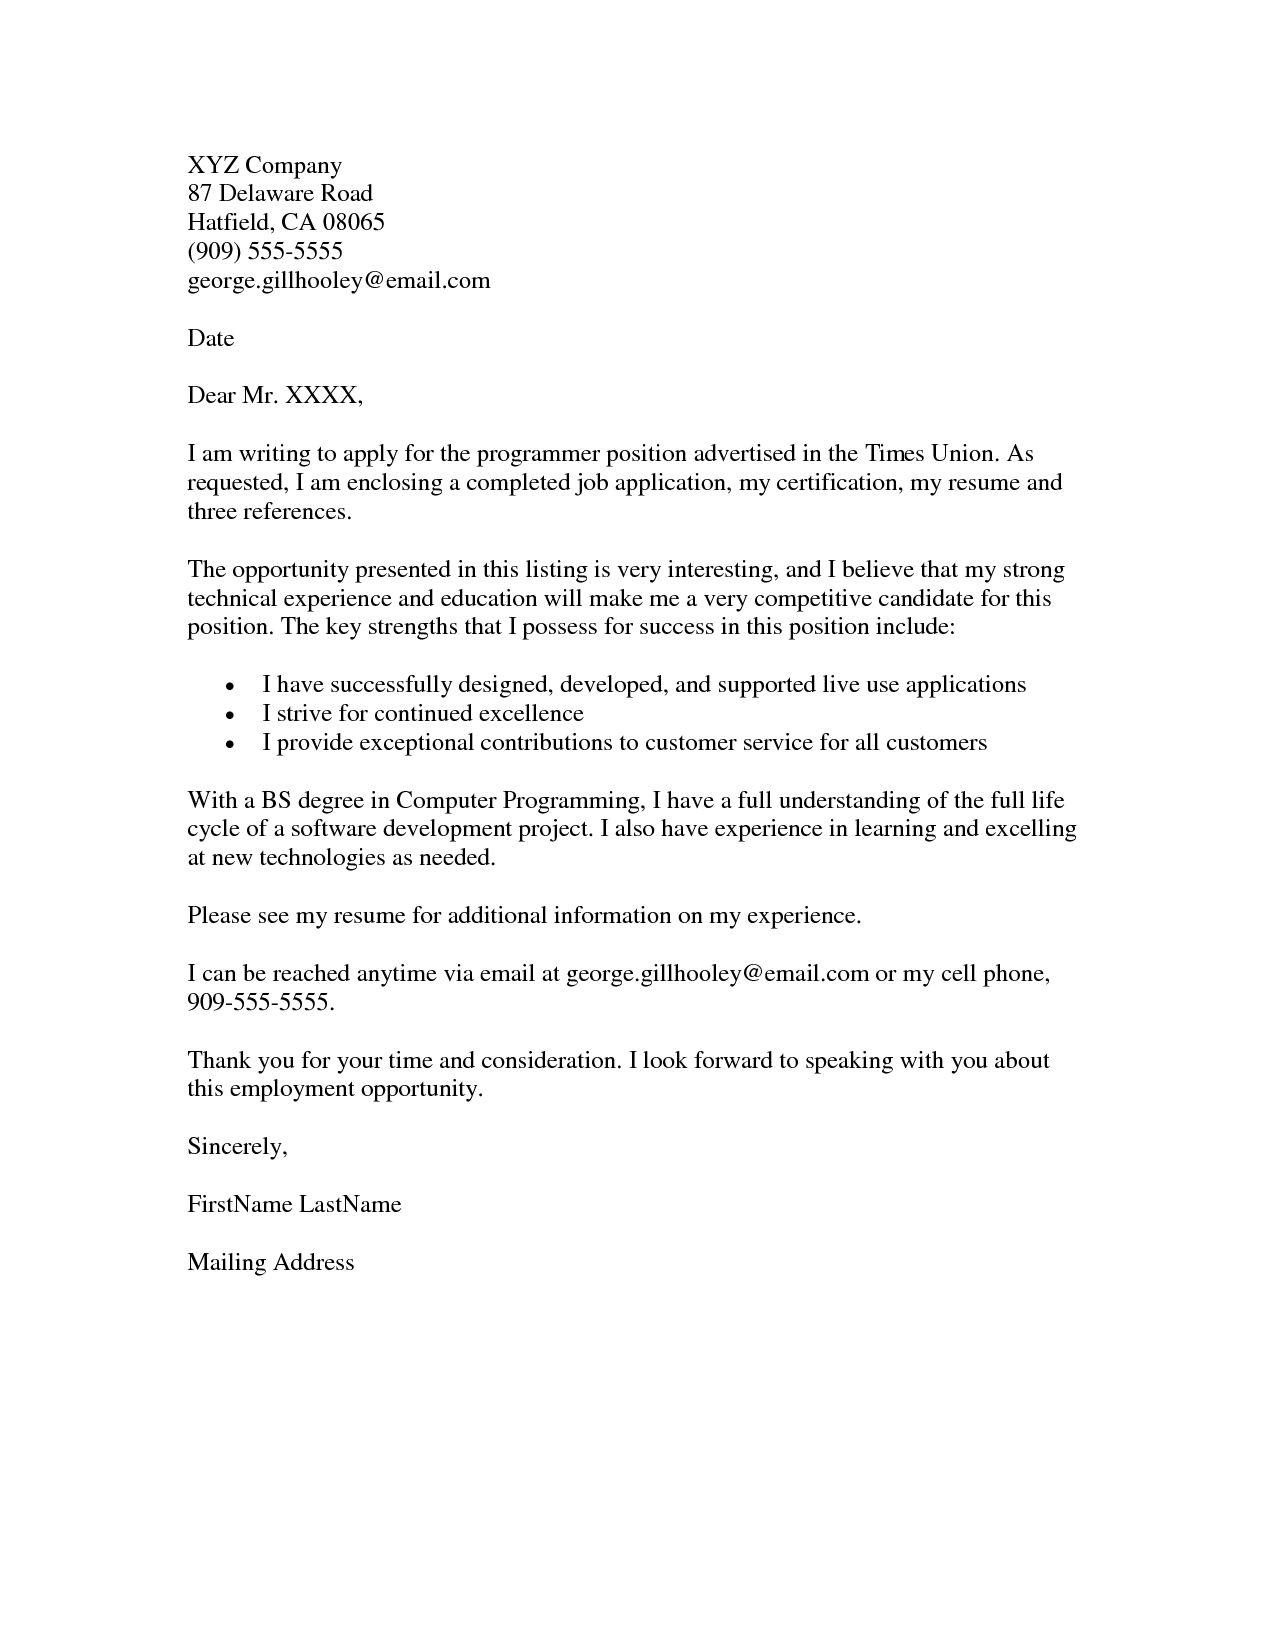 30 Cover Letter For Job Application Cover Letter Designs Job